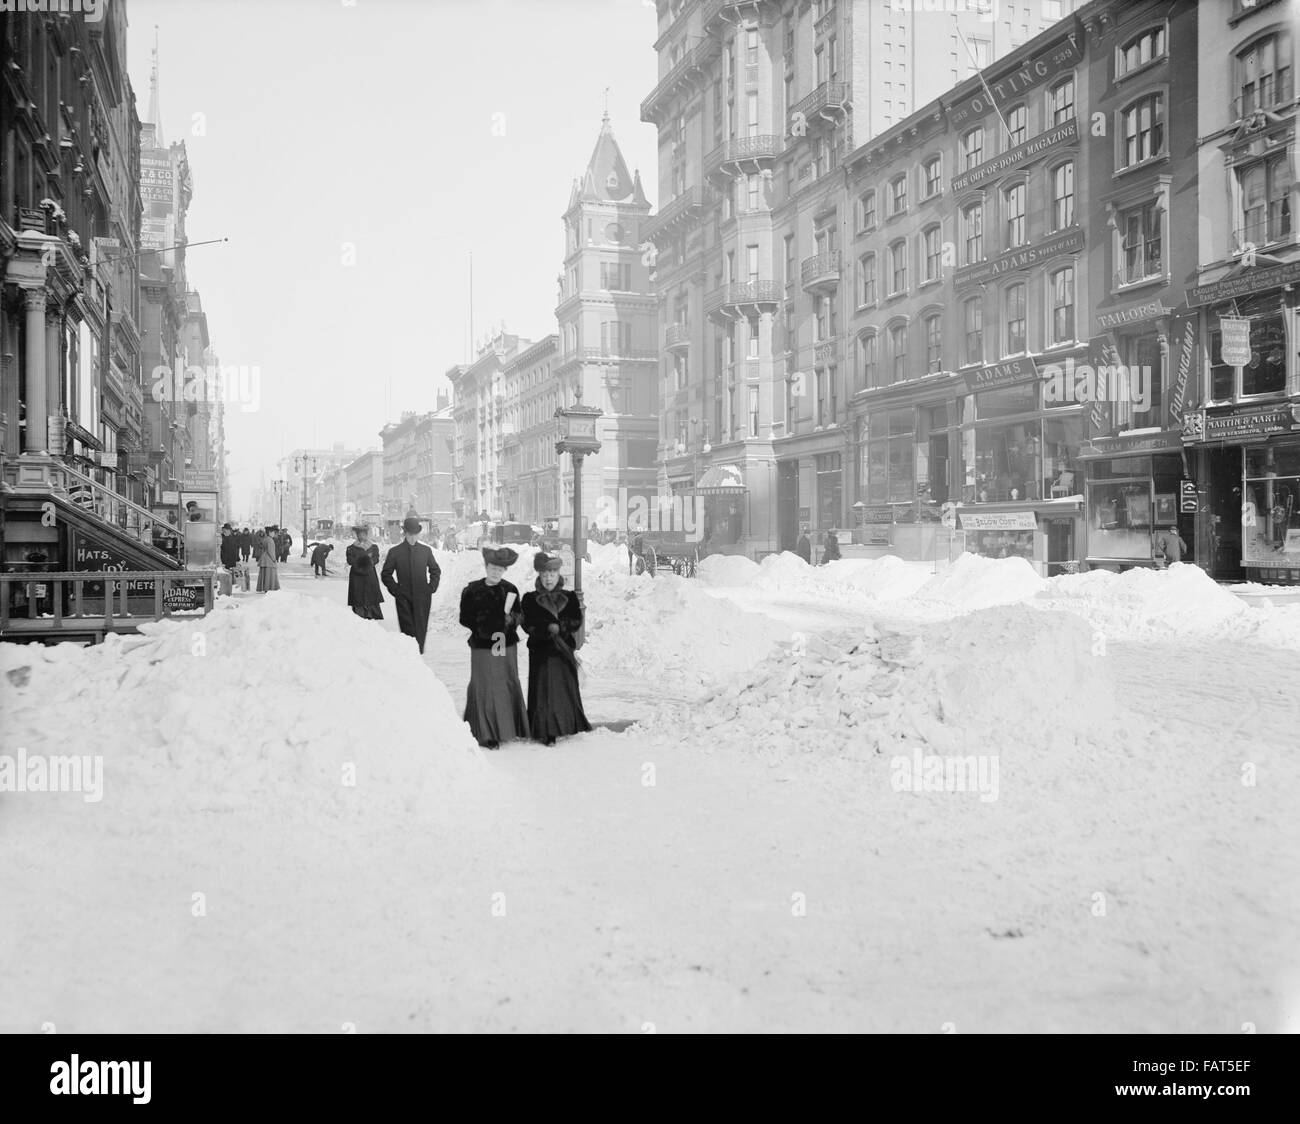 Fifth Avenue after Snow Storm, New York City, USA, circa 1905 Stock Photo